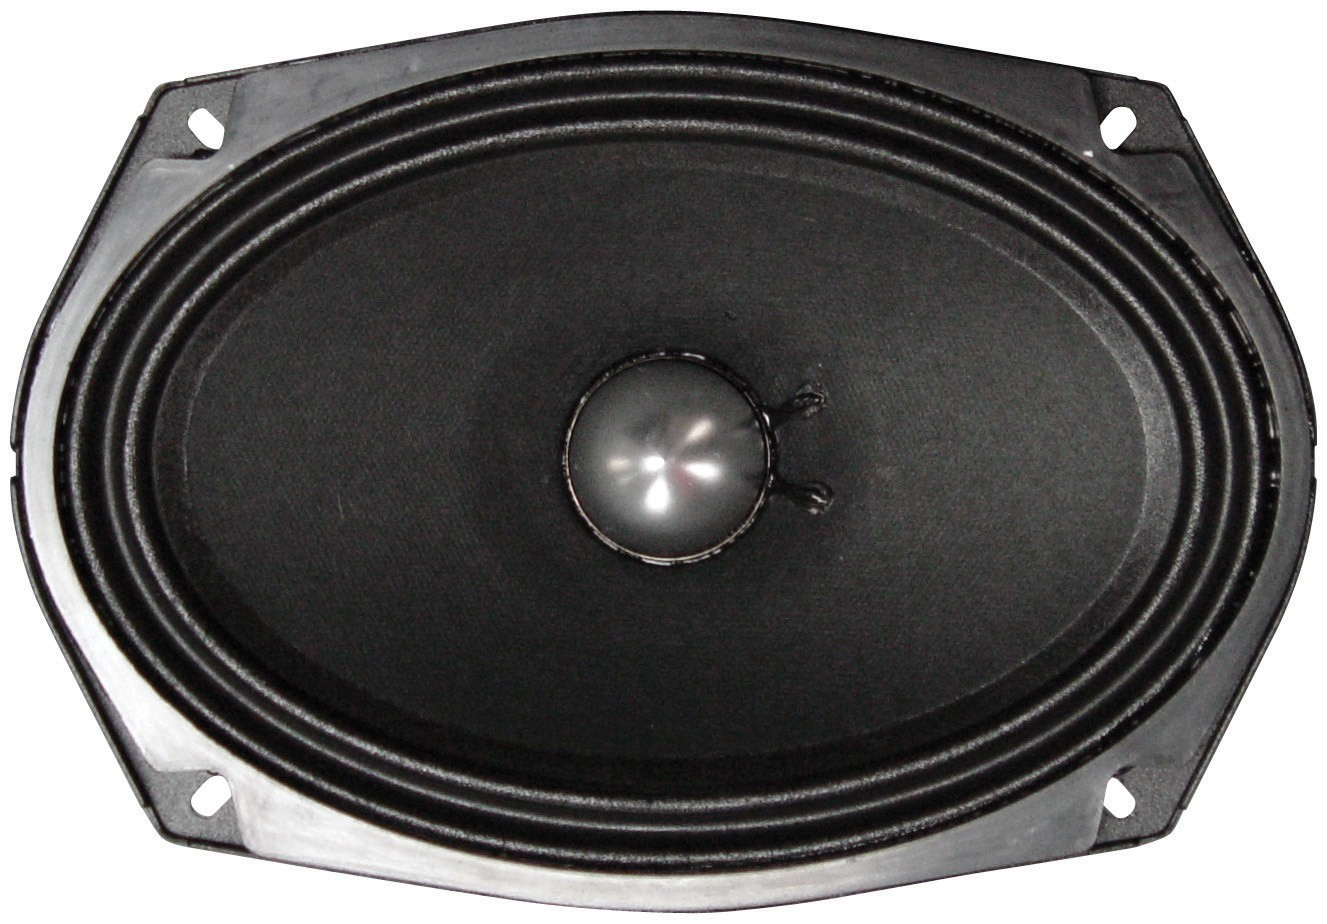 "*Pick 2 priced as pair*American Bass 6x9"" Midrange Speaker"